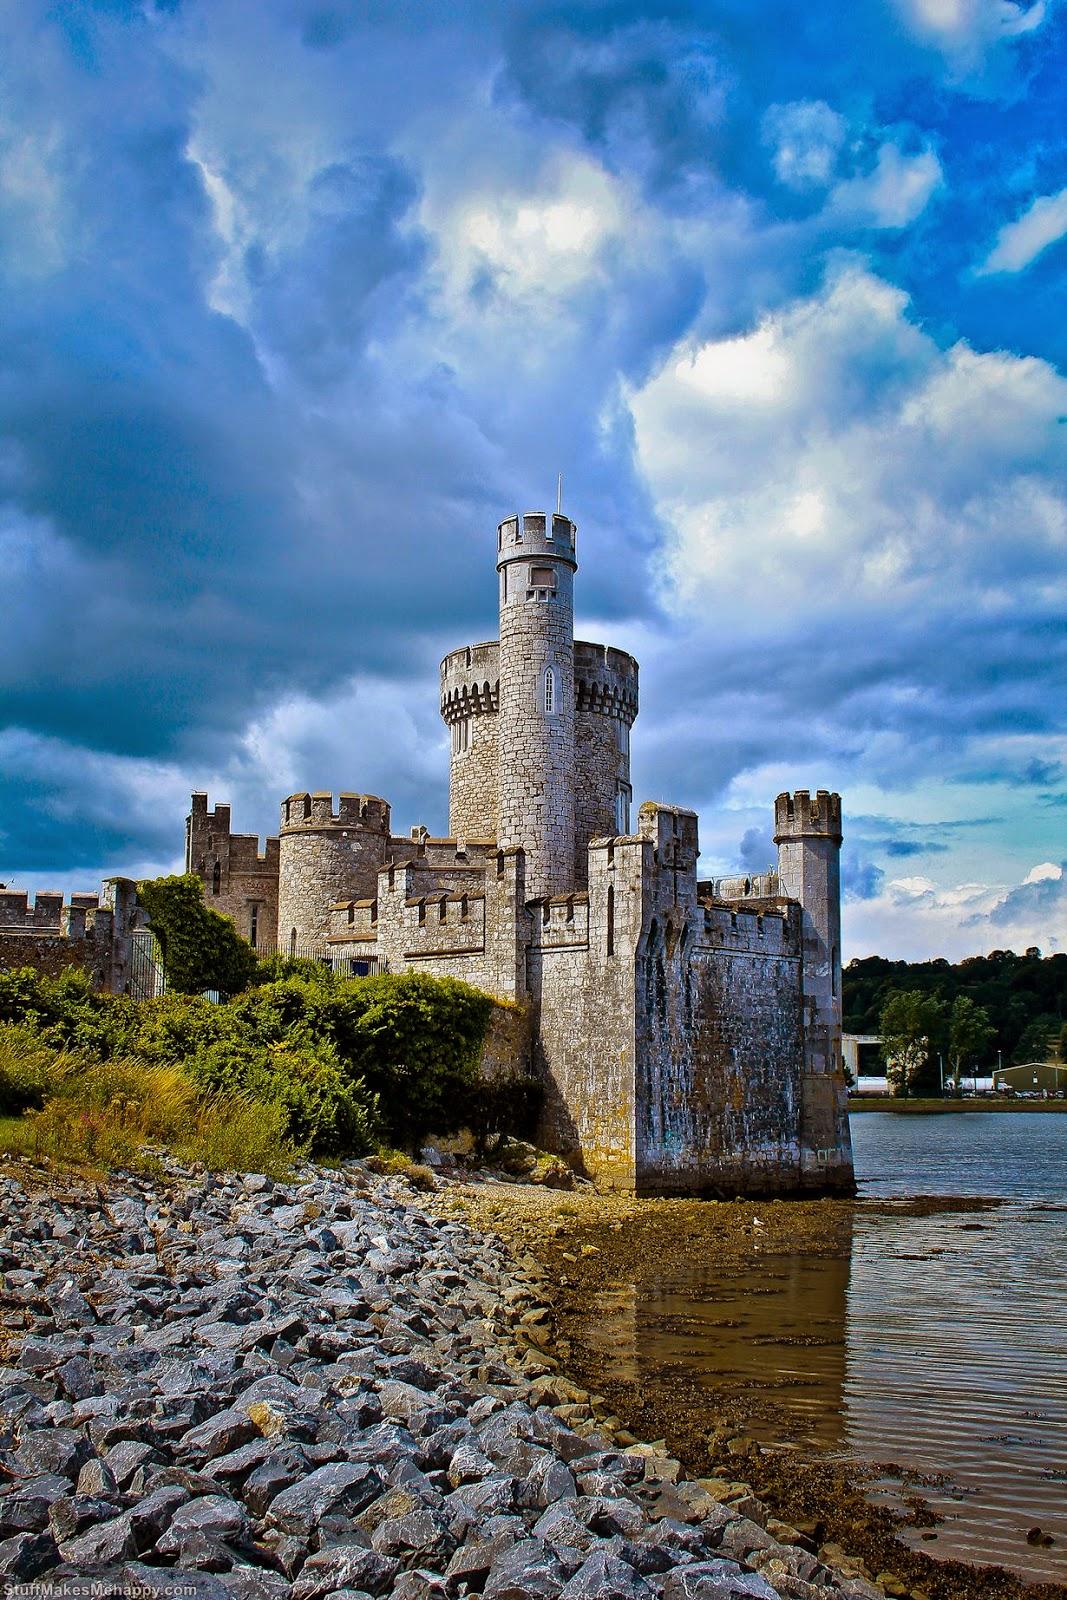 Blackrock Castle - Photo by John Hughes